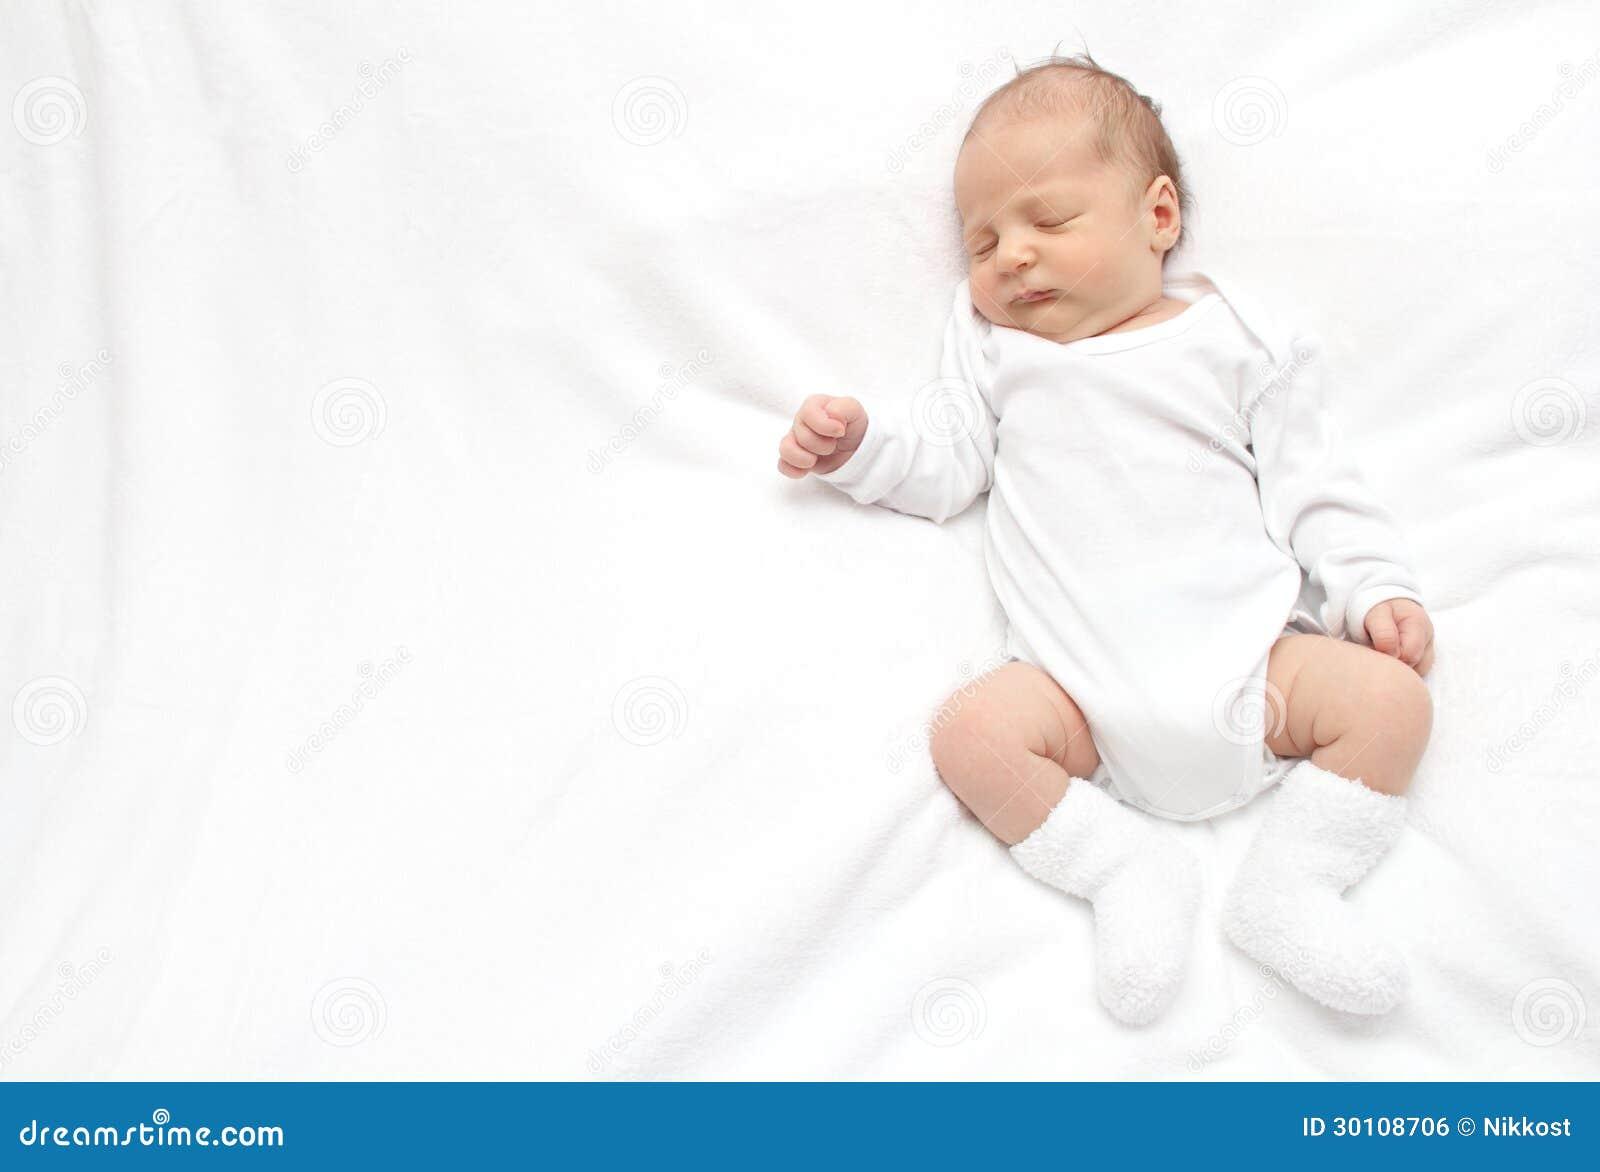 Sleeping Baby Royalty Free Stock Image - Image: 30108706